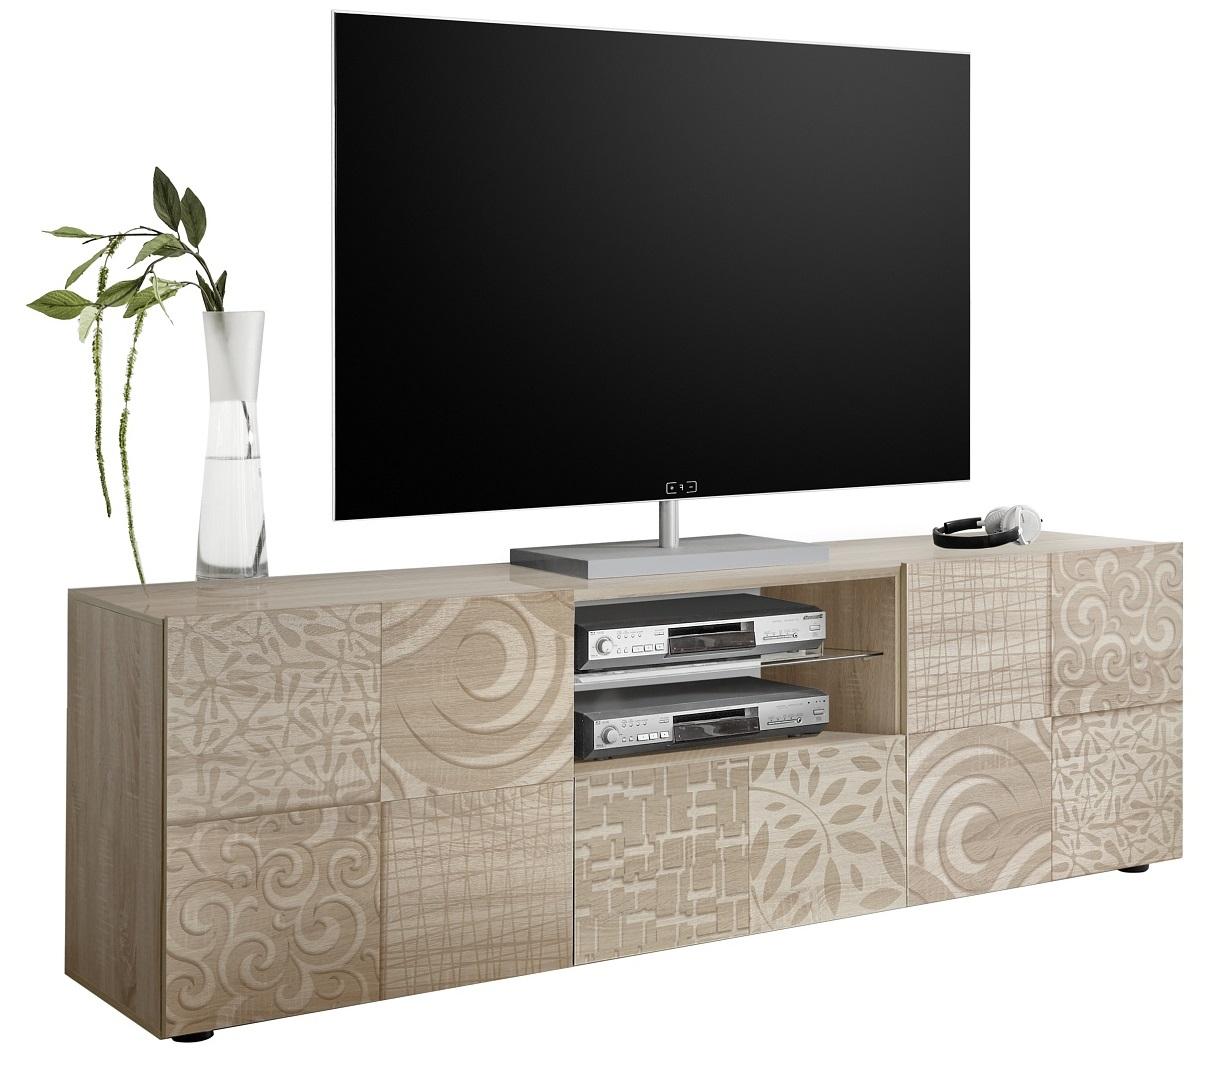 Tv-meubel Miro 181 cm breed in sonoma eiken | Pesaro Mobilia